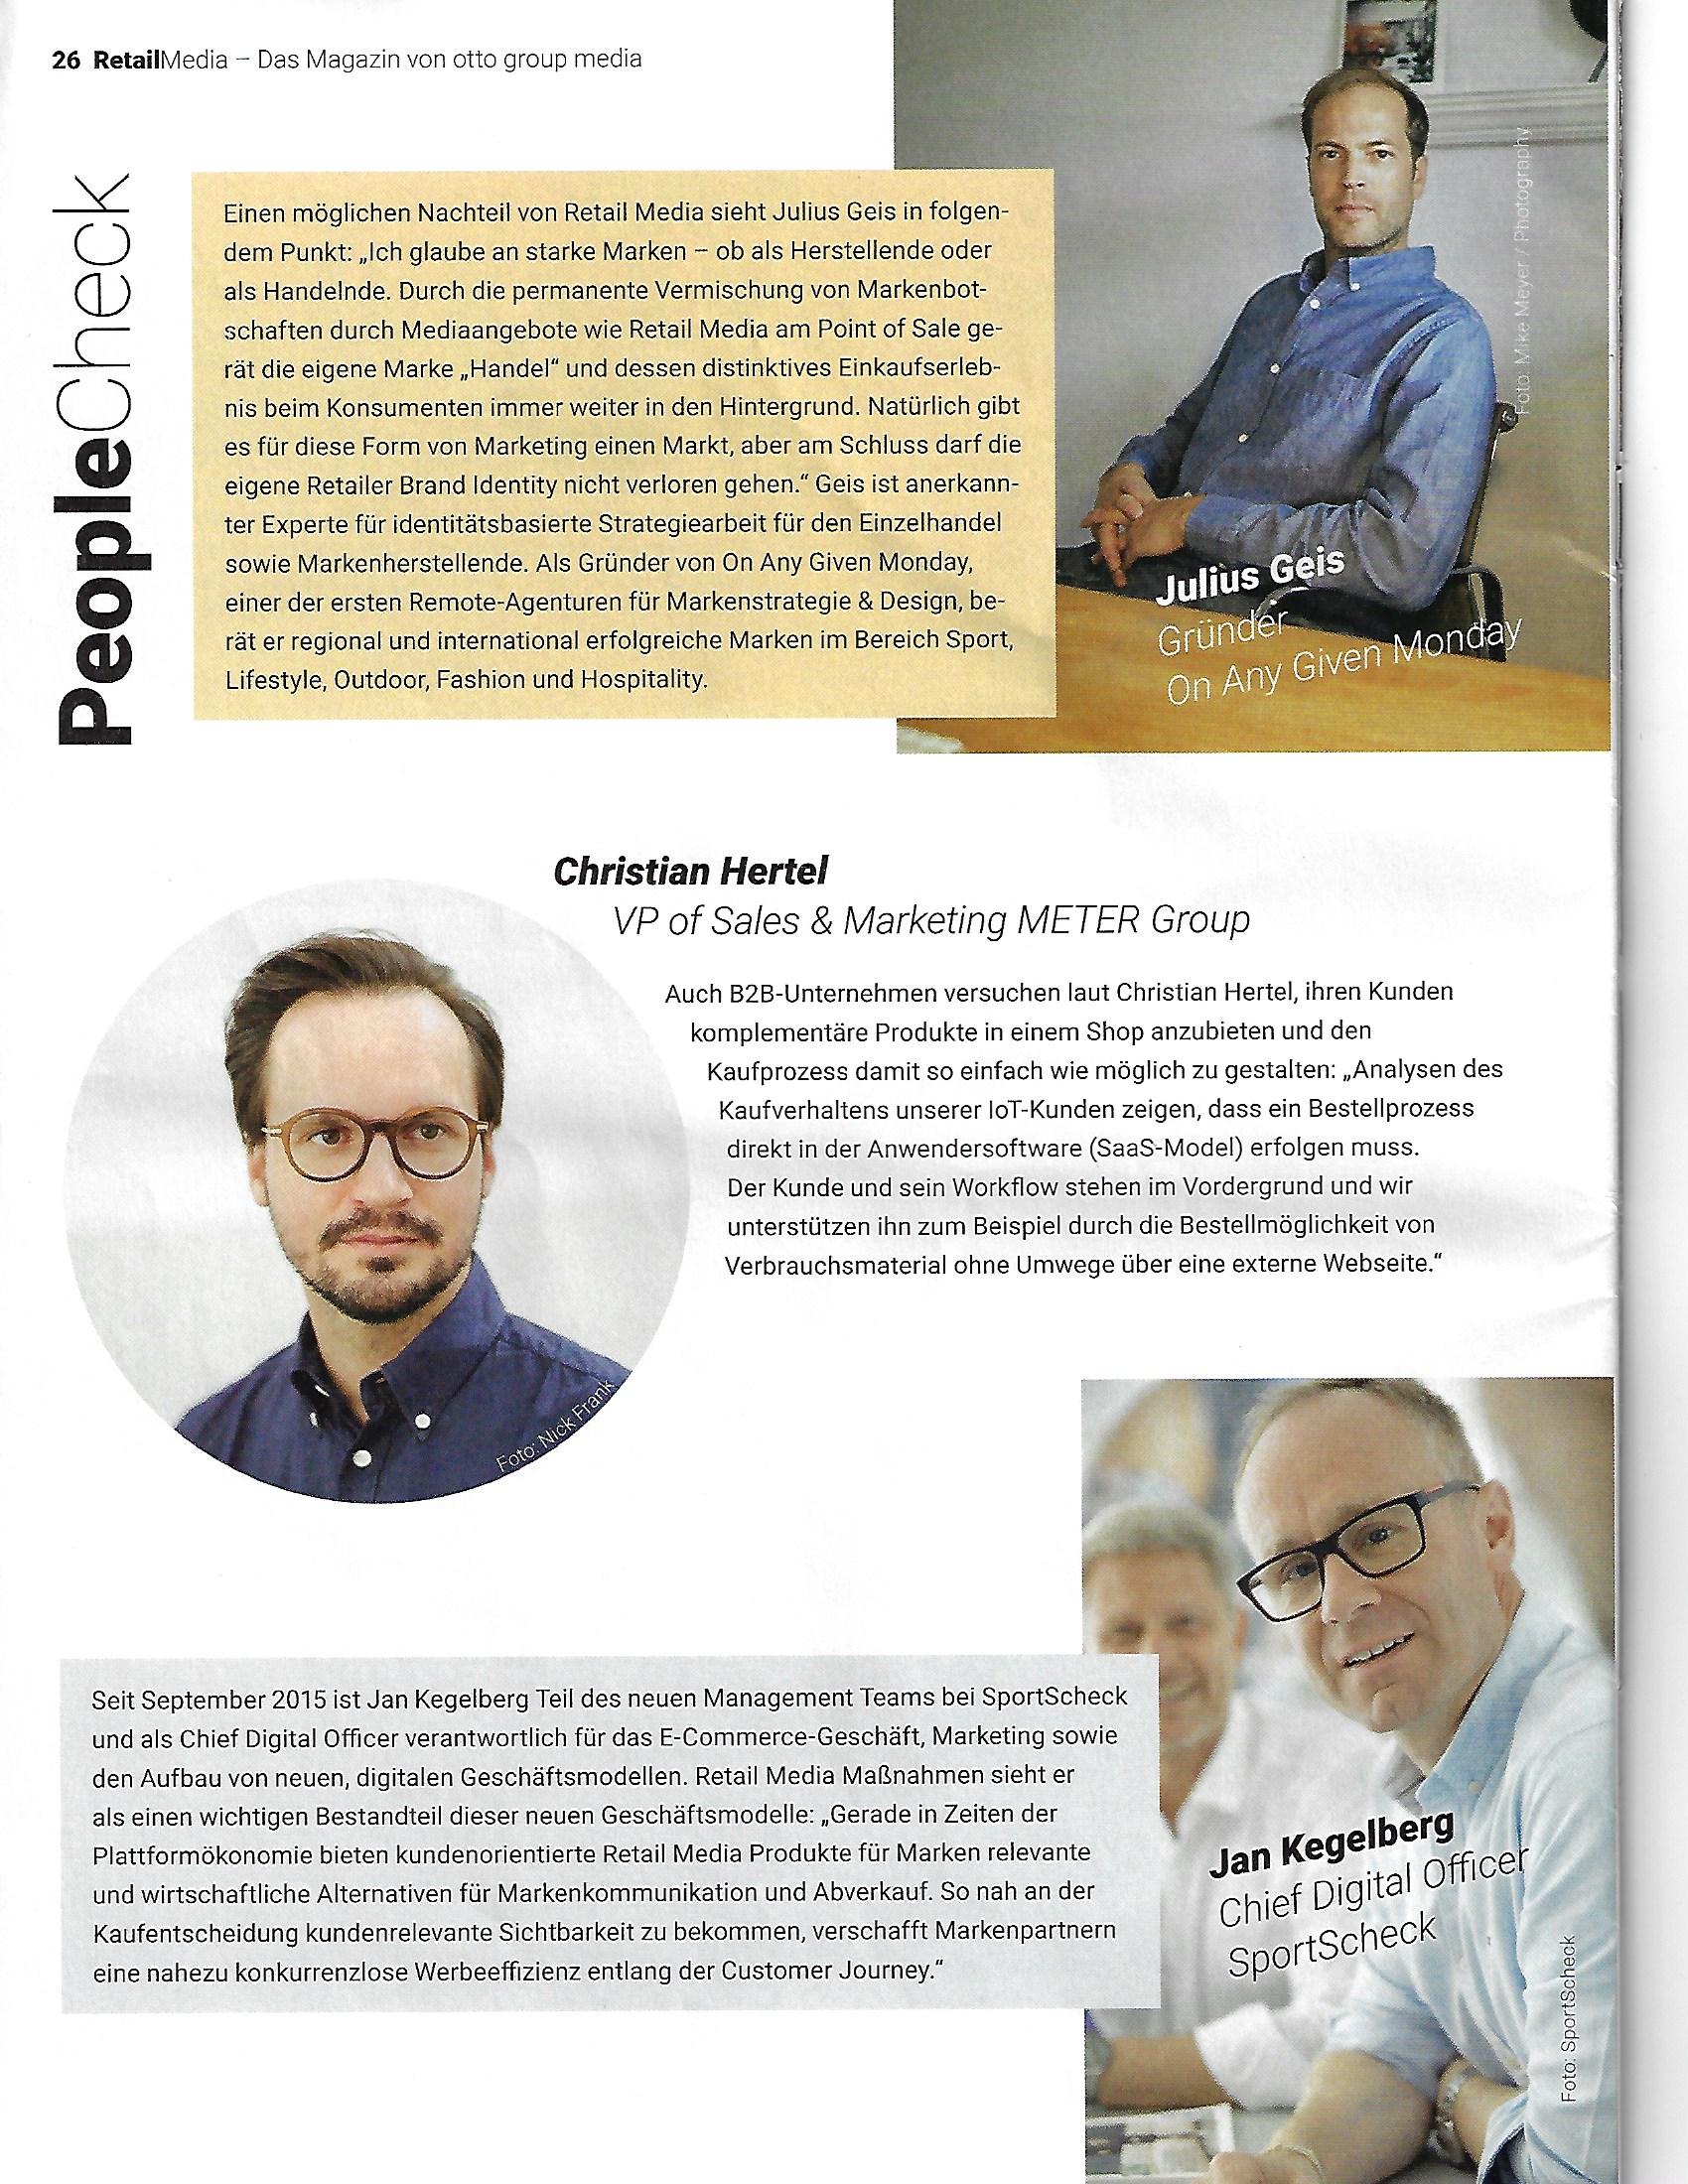 © RetailMedia - Das Magazin von otto group media, Page 26